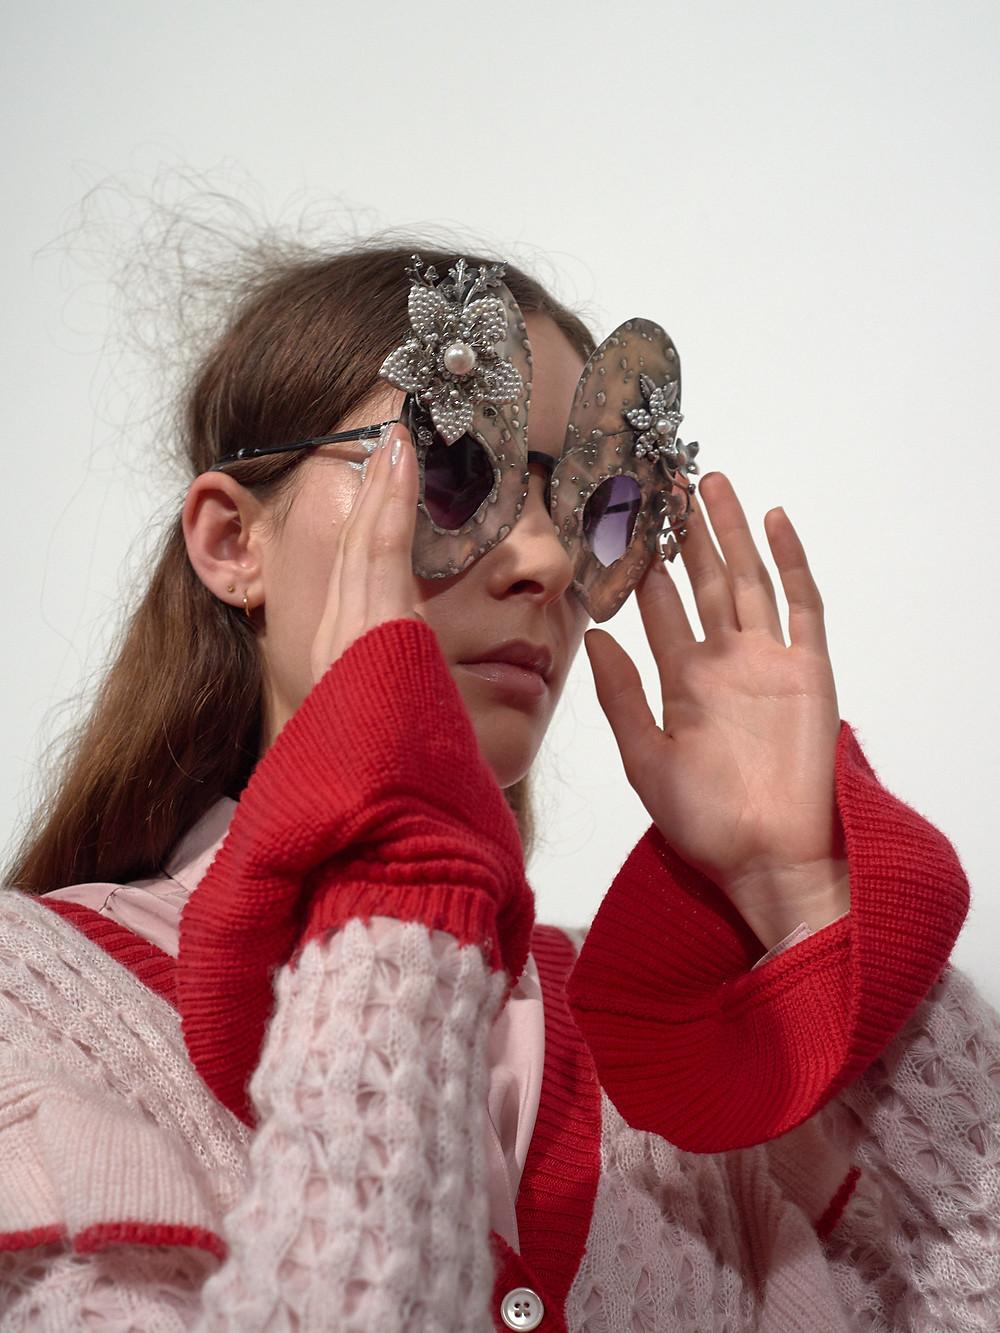 Bora Aksu Sunglasses Collaboration Halo & Co